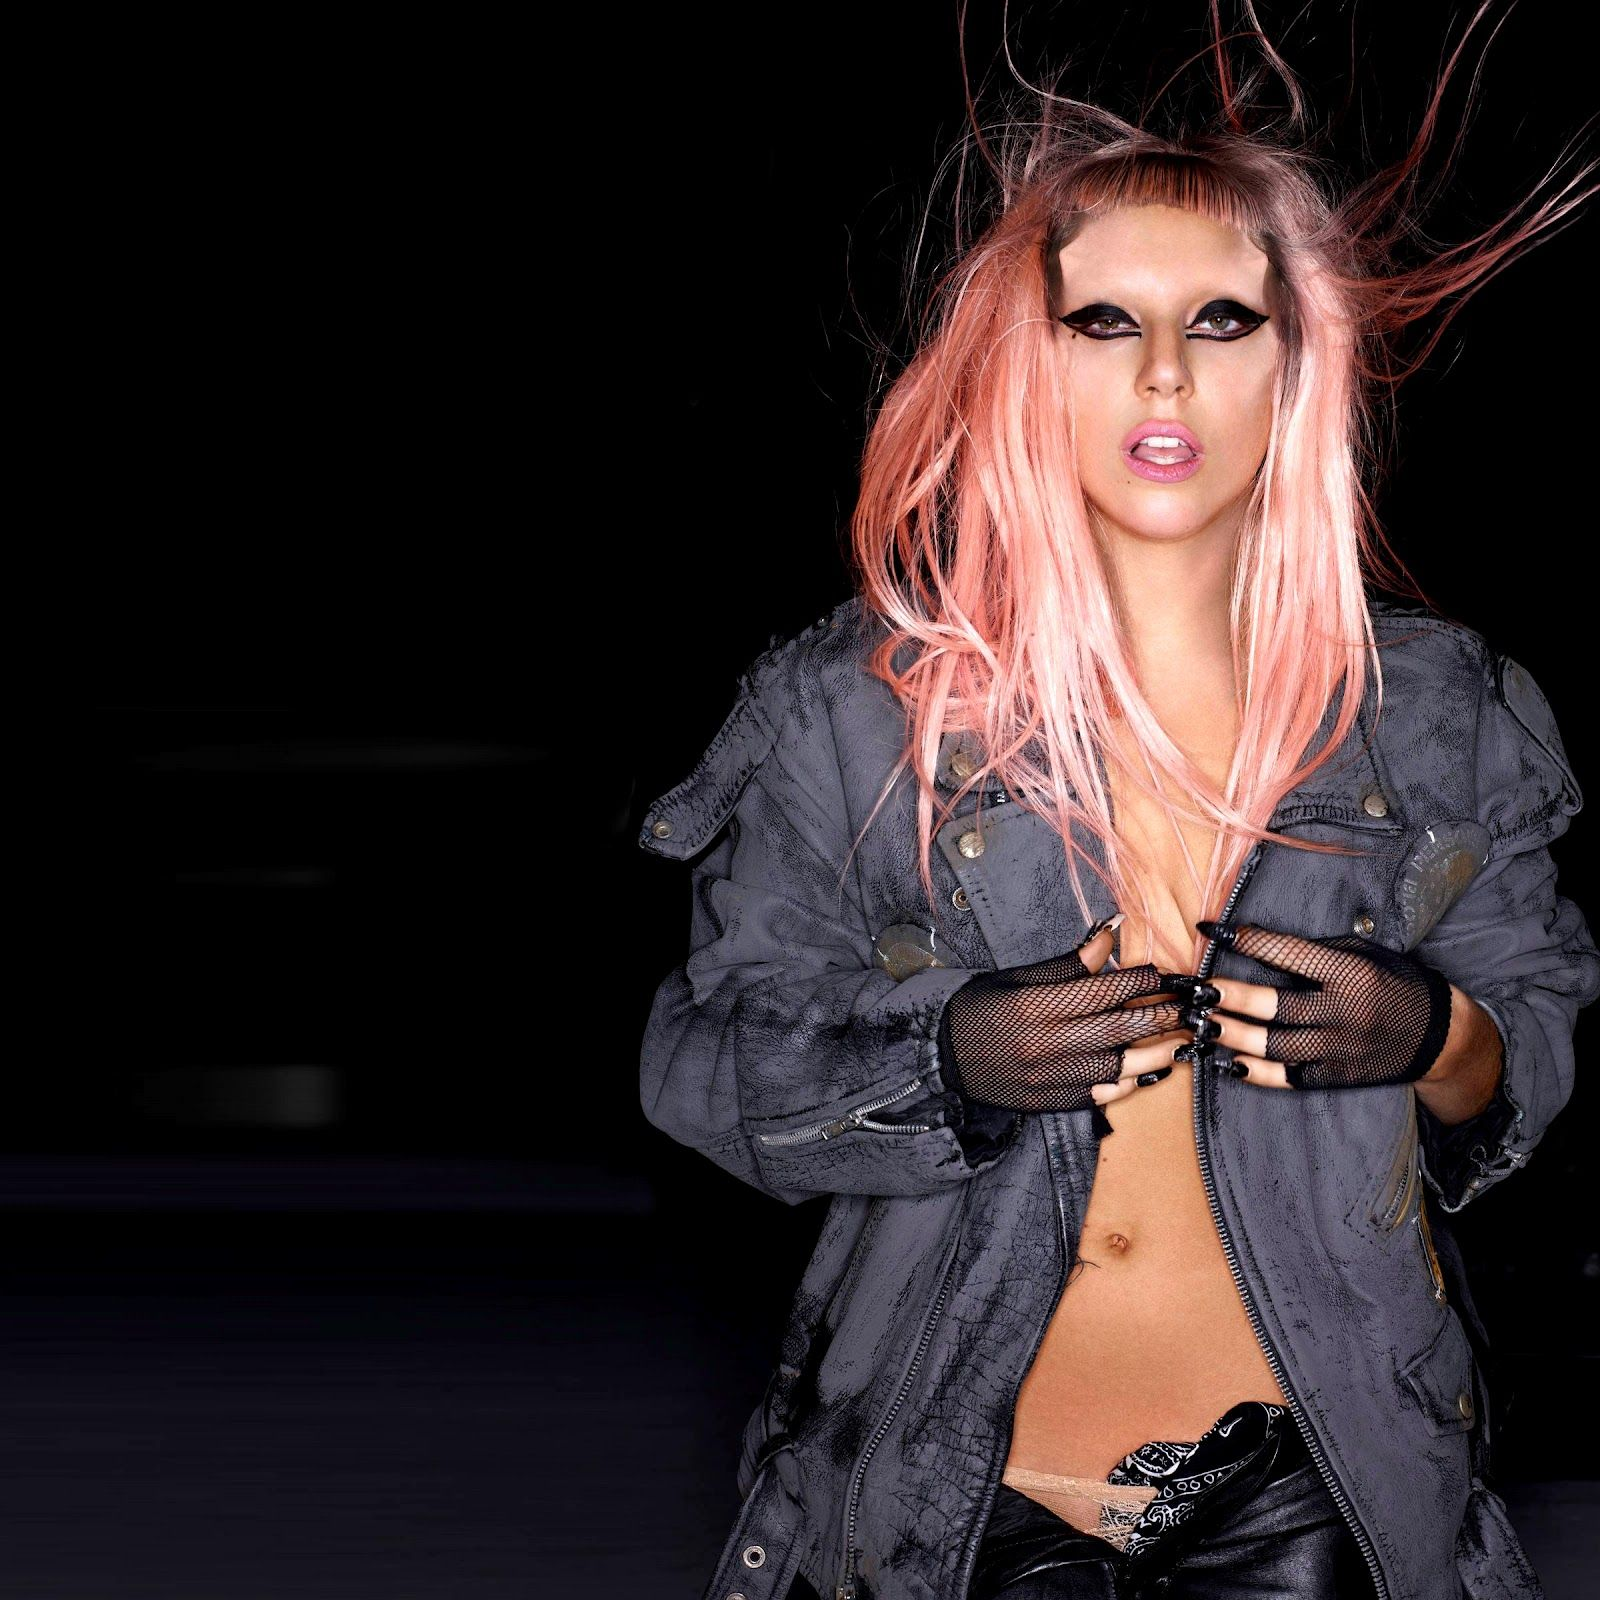 Google themes lady gaga - Lady Gaga Born This Way Photoshoot Color Google Search